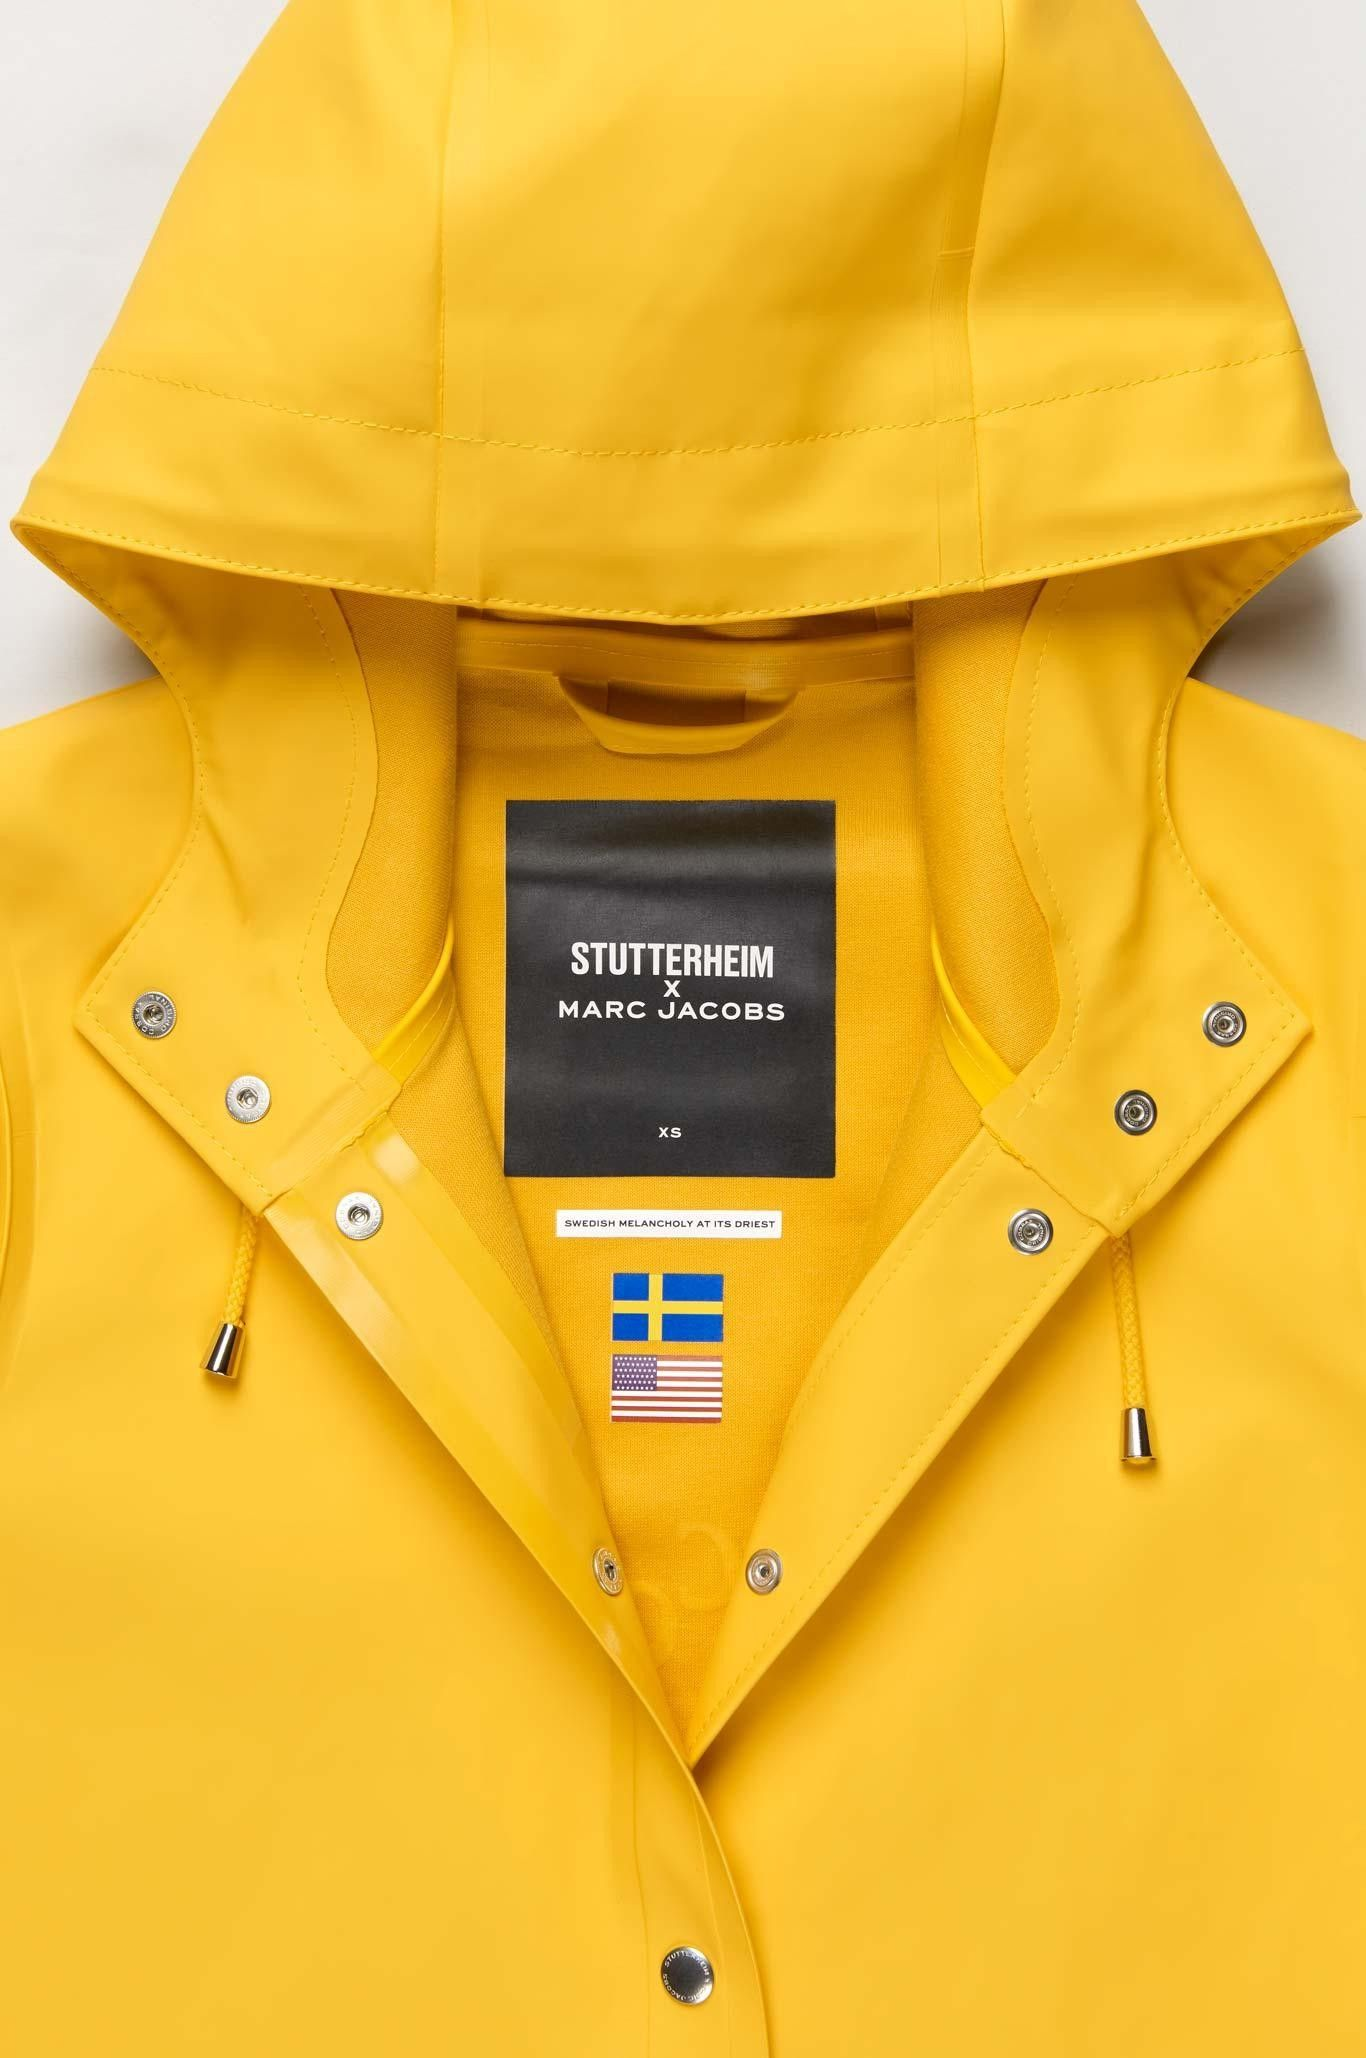 Unisex Mens Womens Rain Coat Waterproof Windbreaker Hooded Jacket with Detachable Transparent Baffle